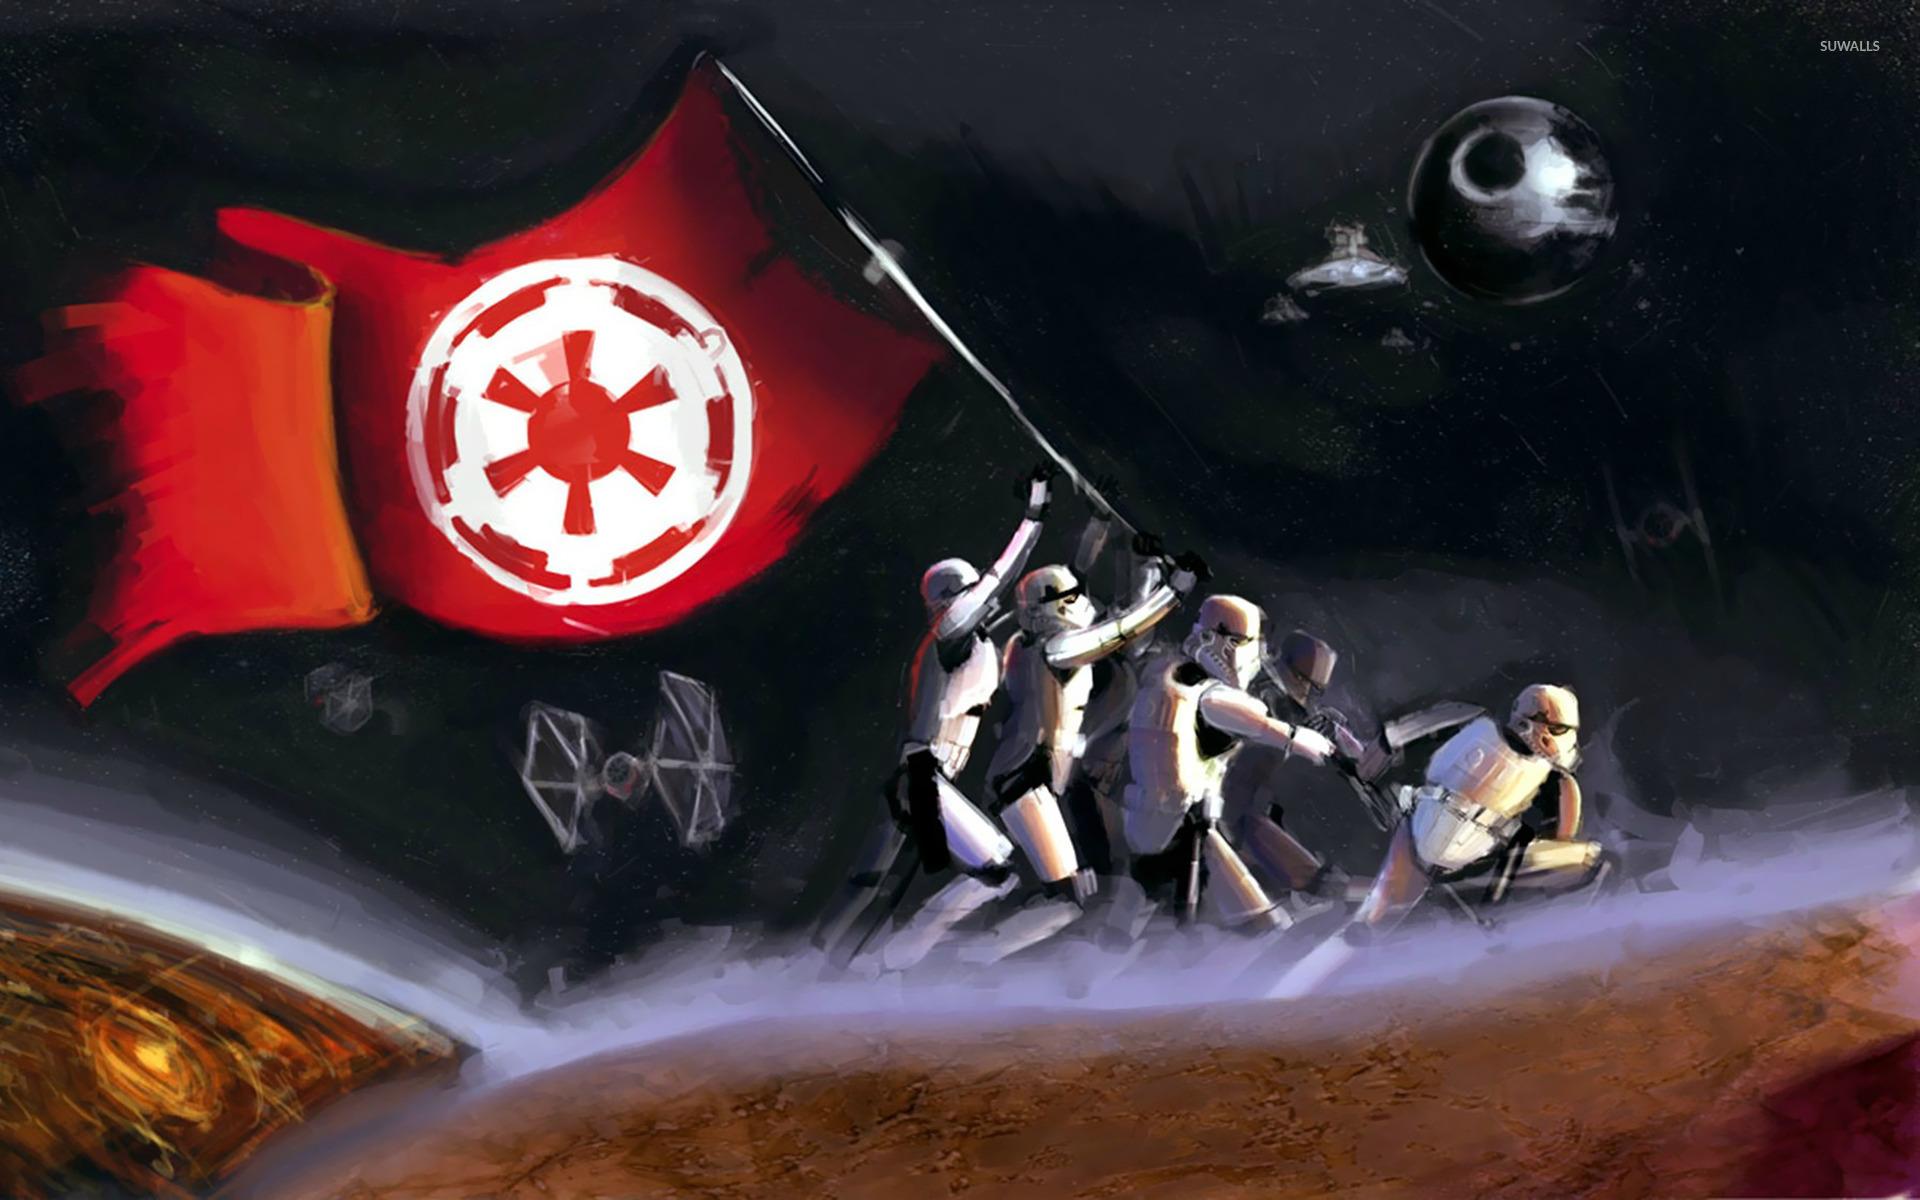 star wars [2] wallpaper - movie wallpapers - #15199